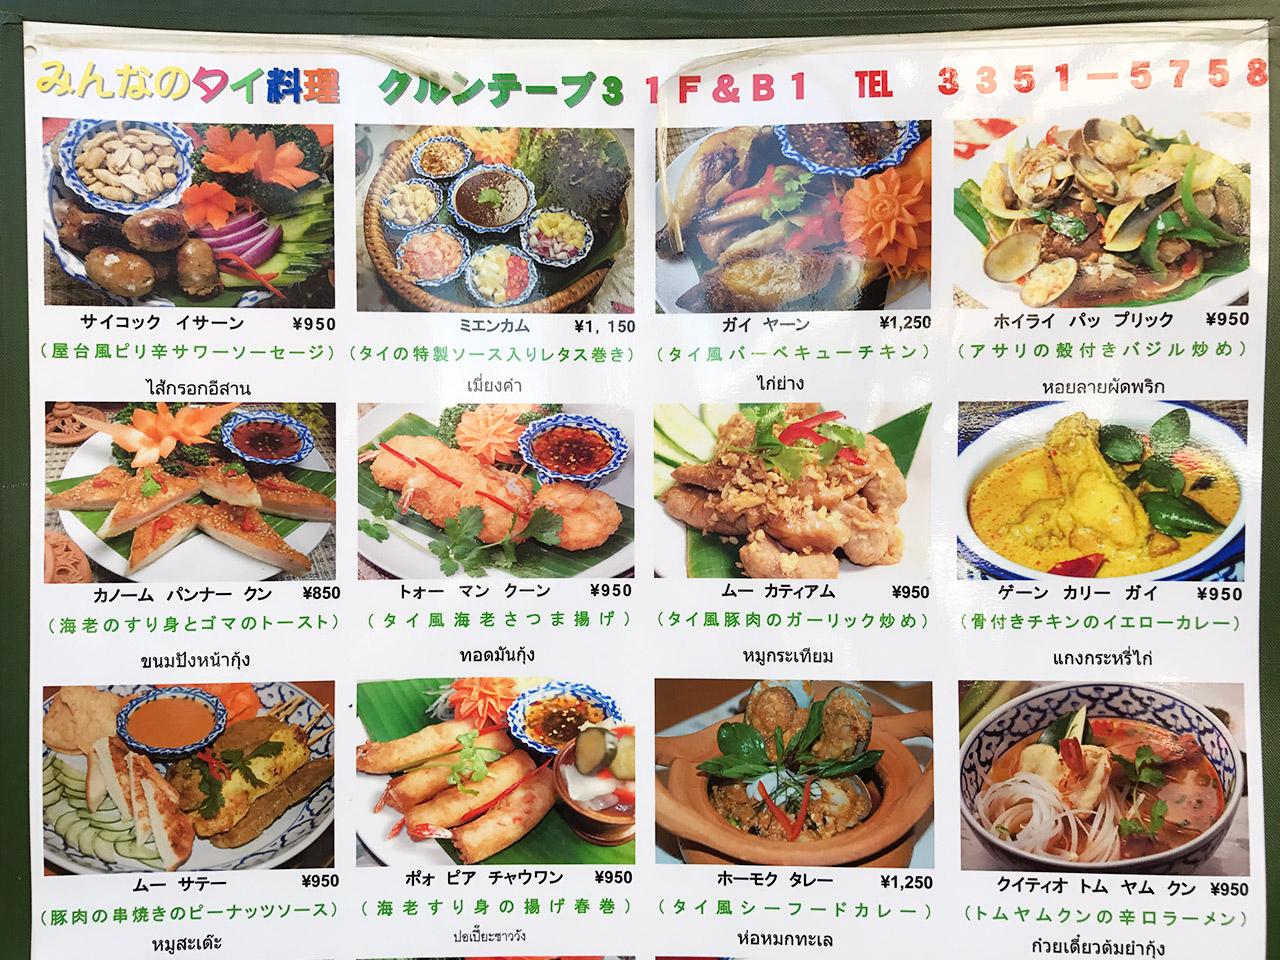 shinjuku-krungthep-menu02